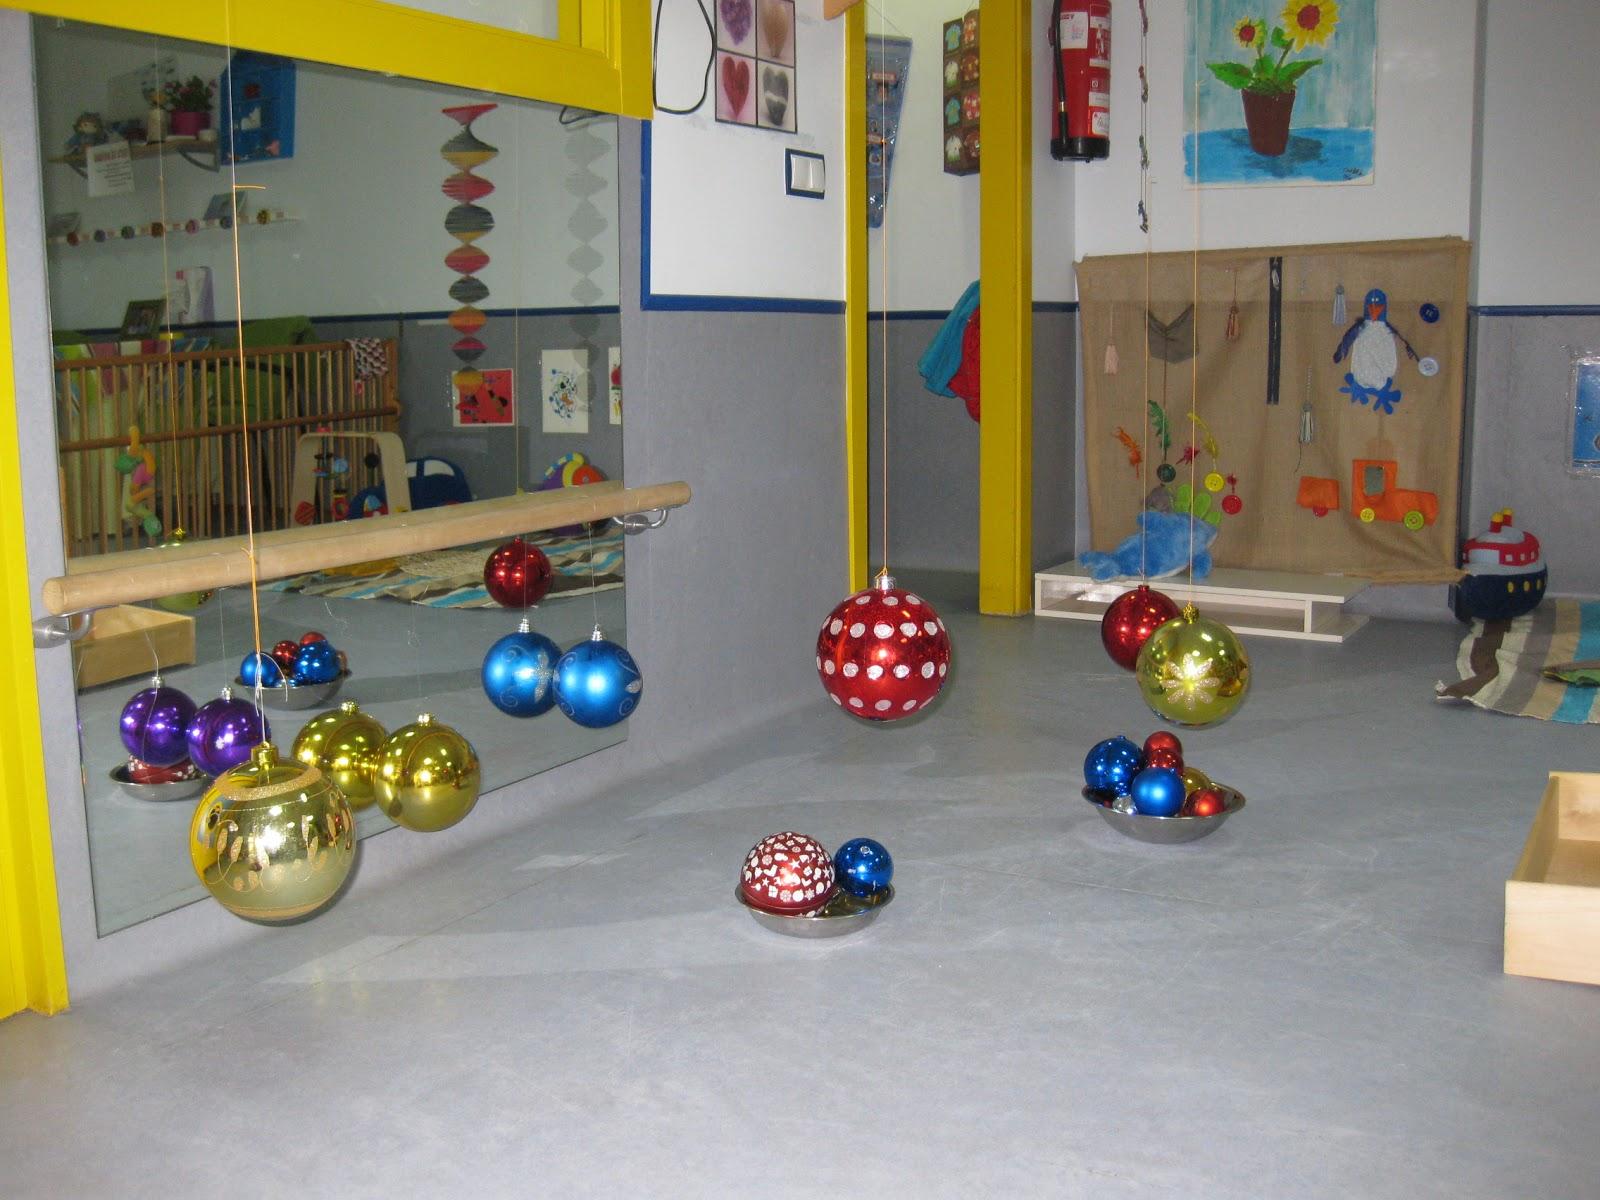 Navidad 2016 decoraci n centro infantil - Decoracion navidad infantil ...